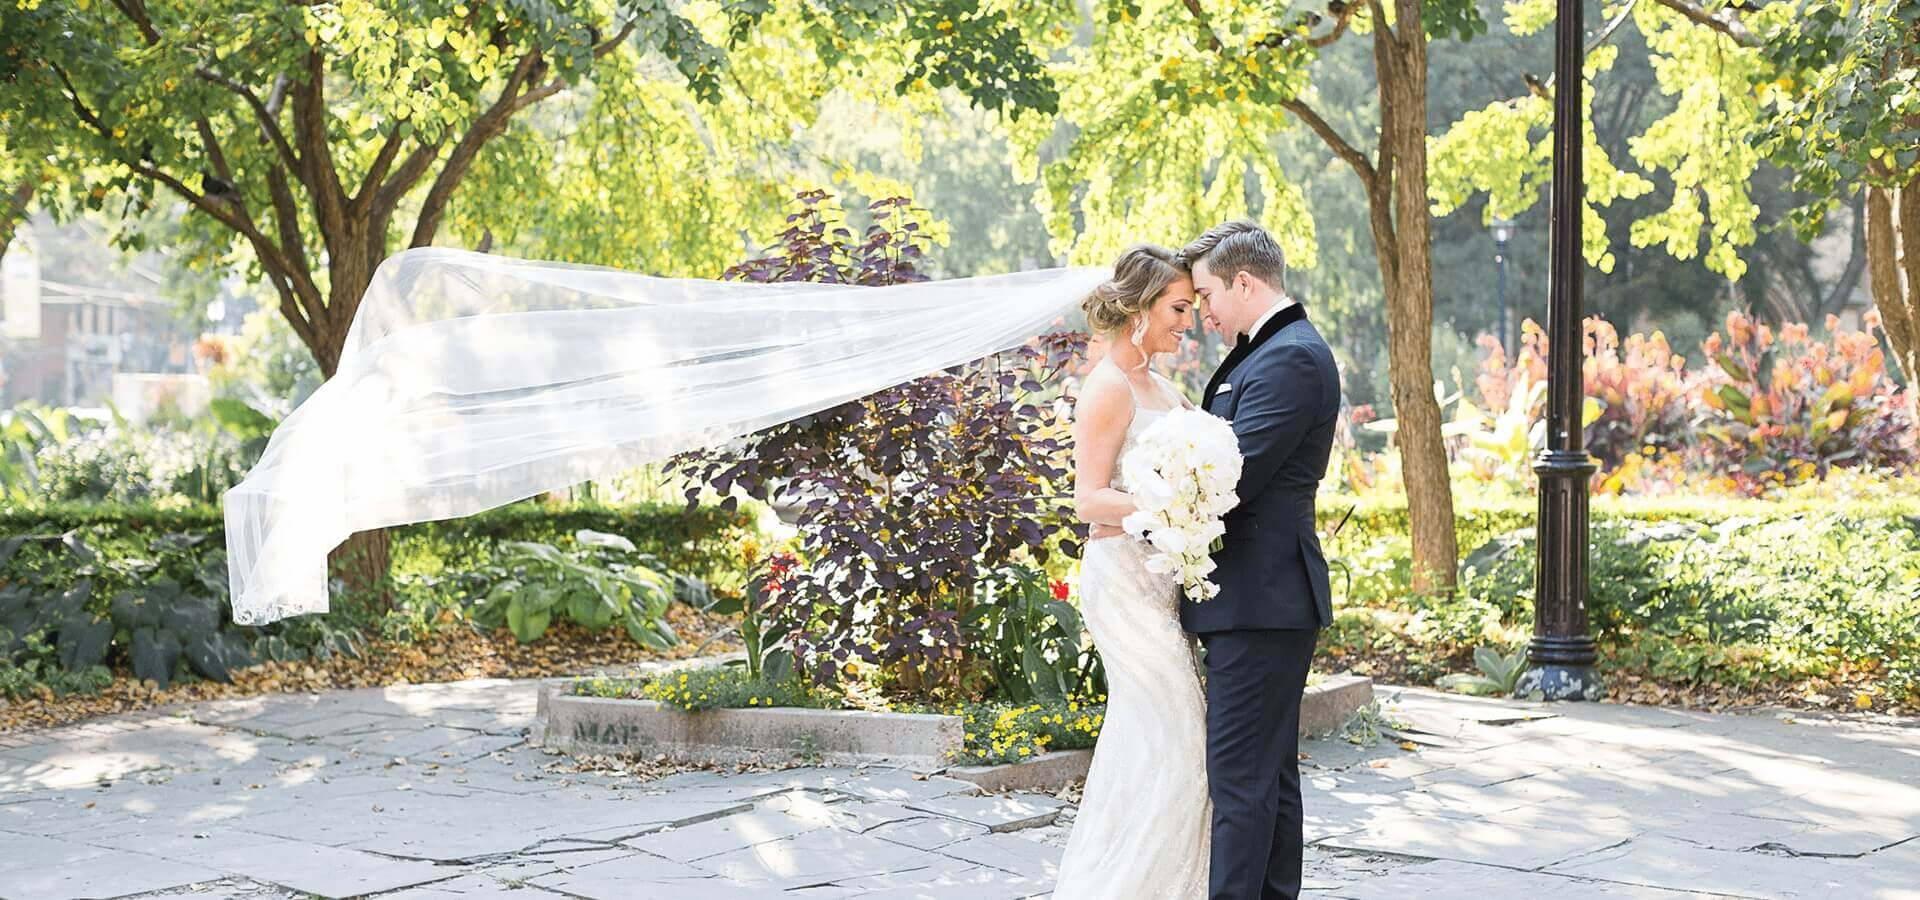 Hero image for Jackie and Keegan's Elegant King Edward Hotel Wedding